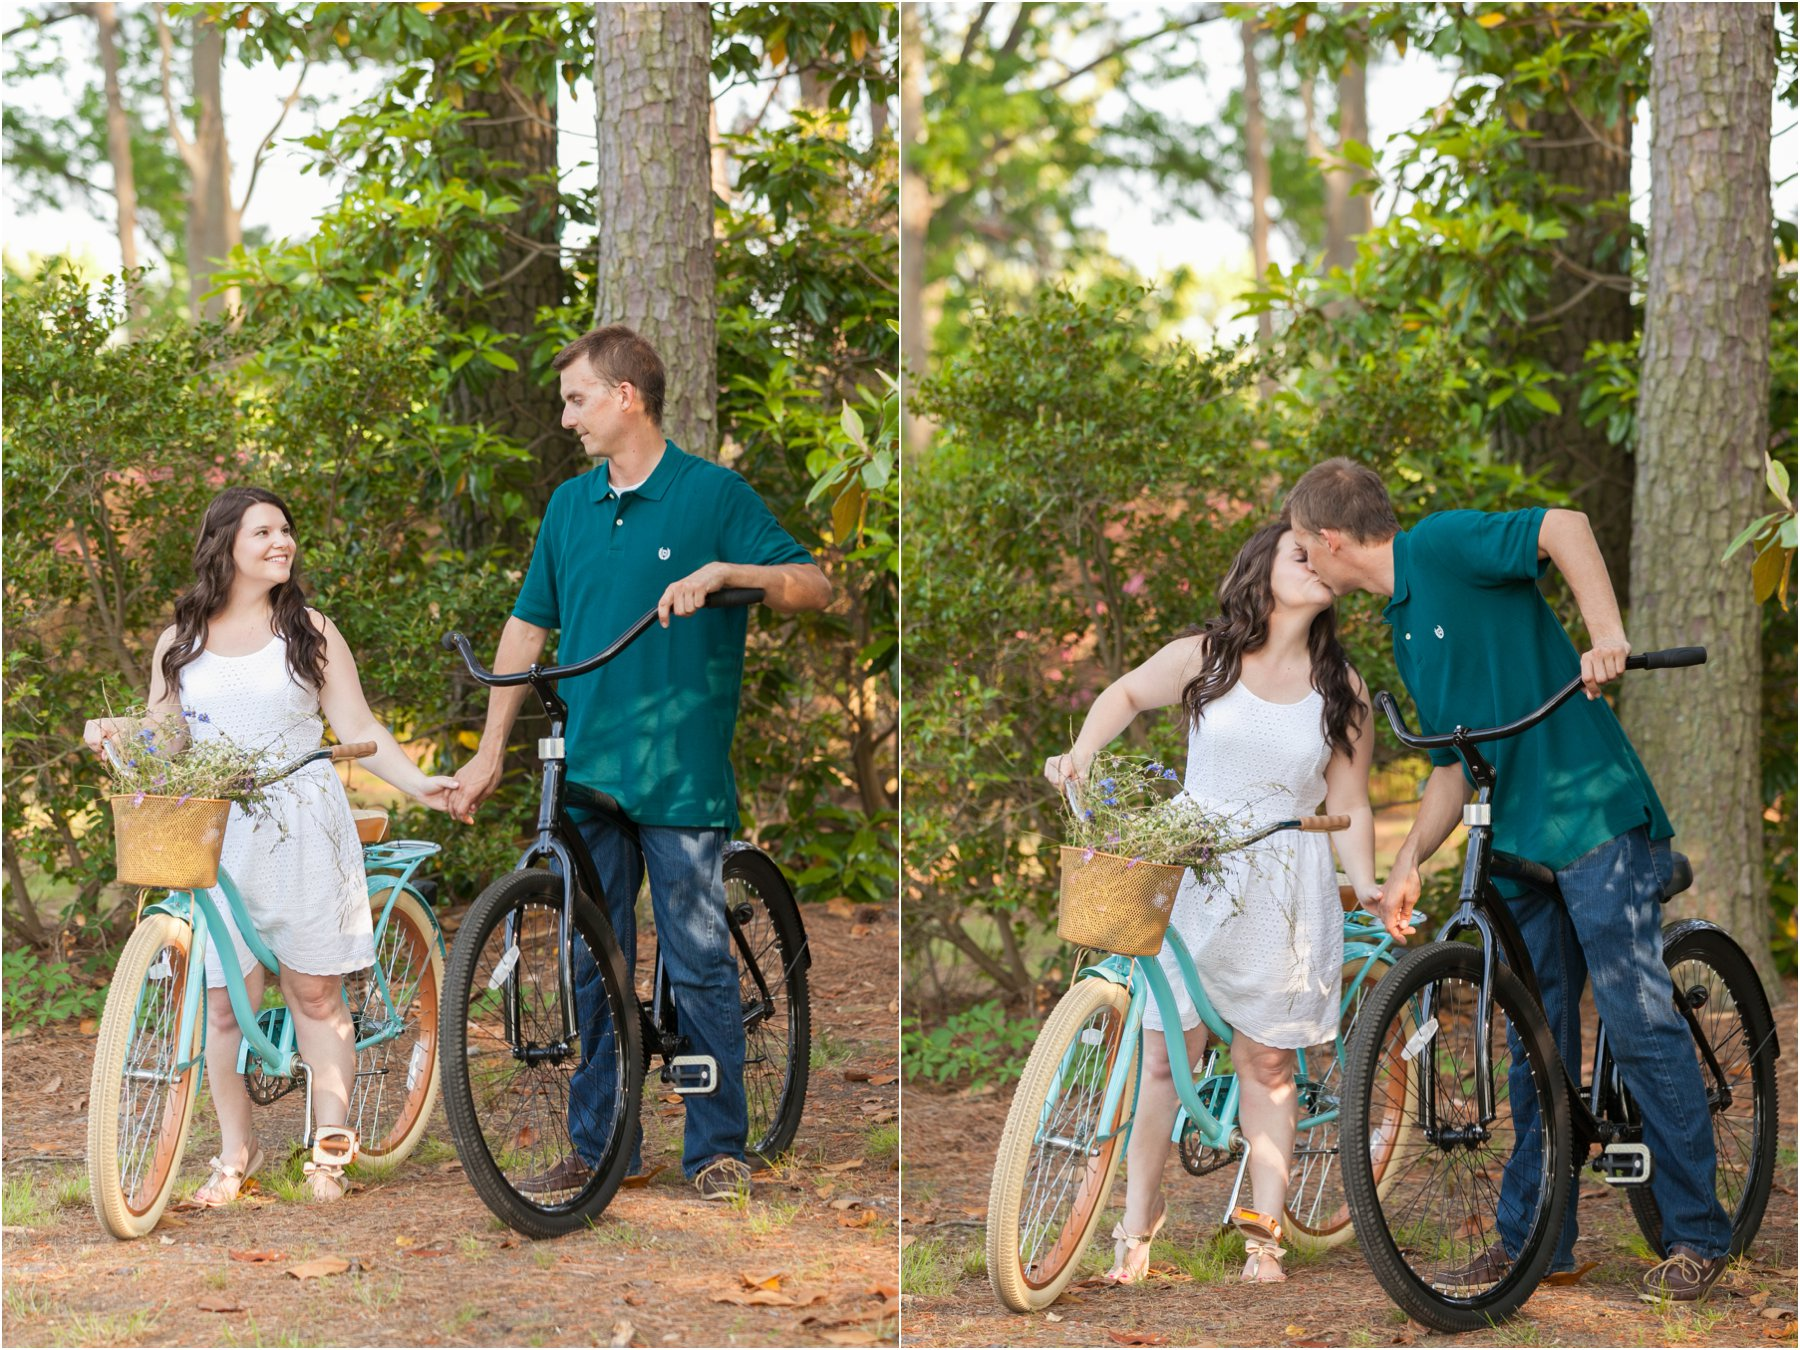 engagement_Photography_bike_ride_engagements_Jessica_Ryan_Photography_virginia_virginia_beach_0319